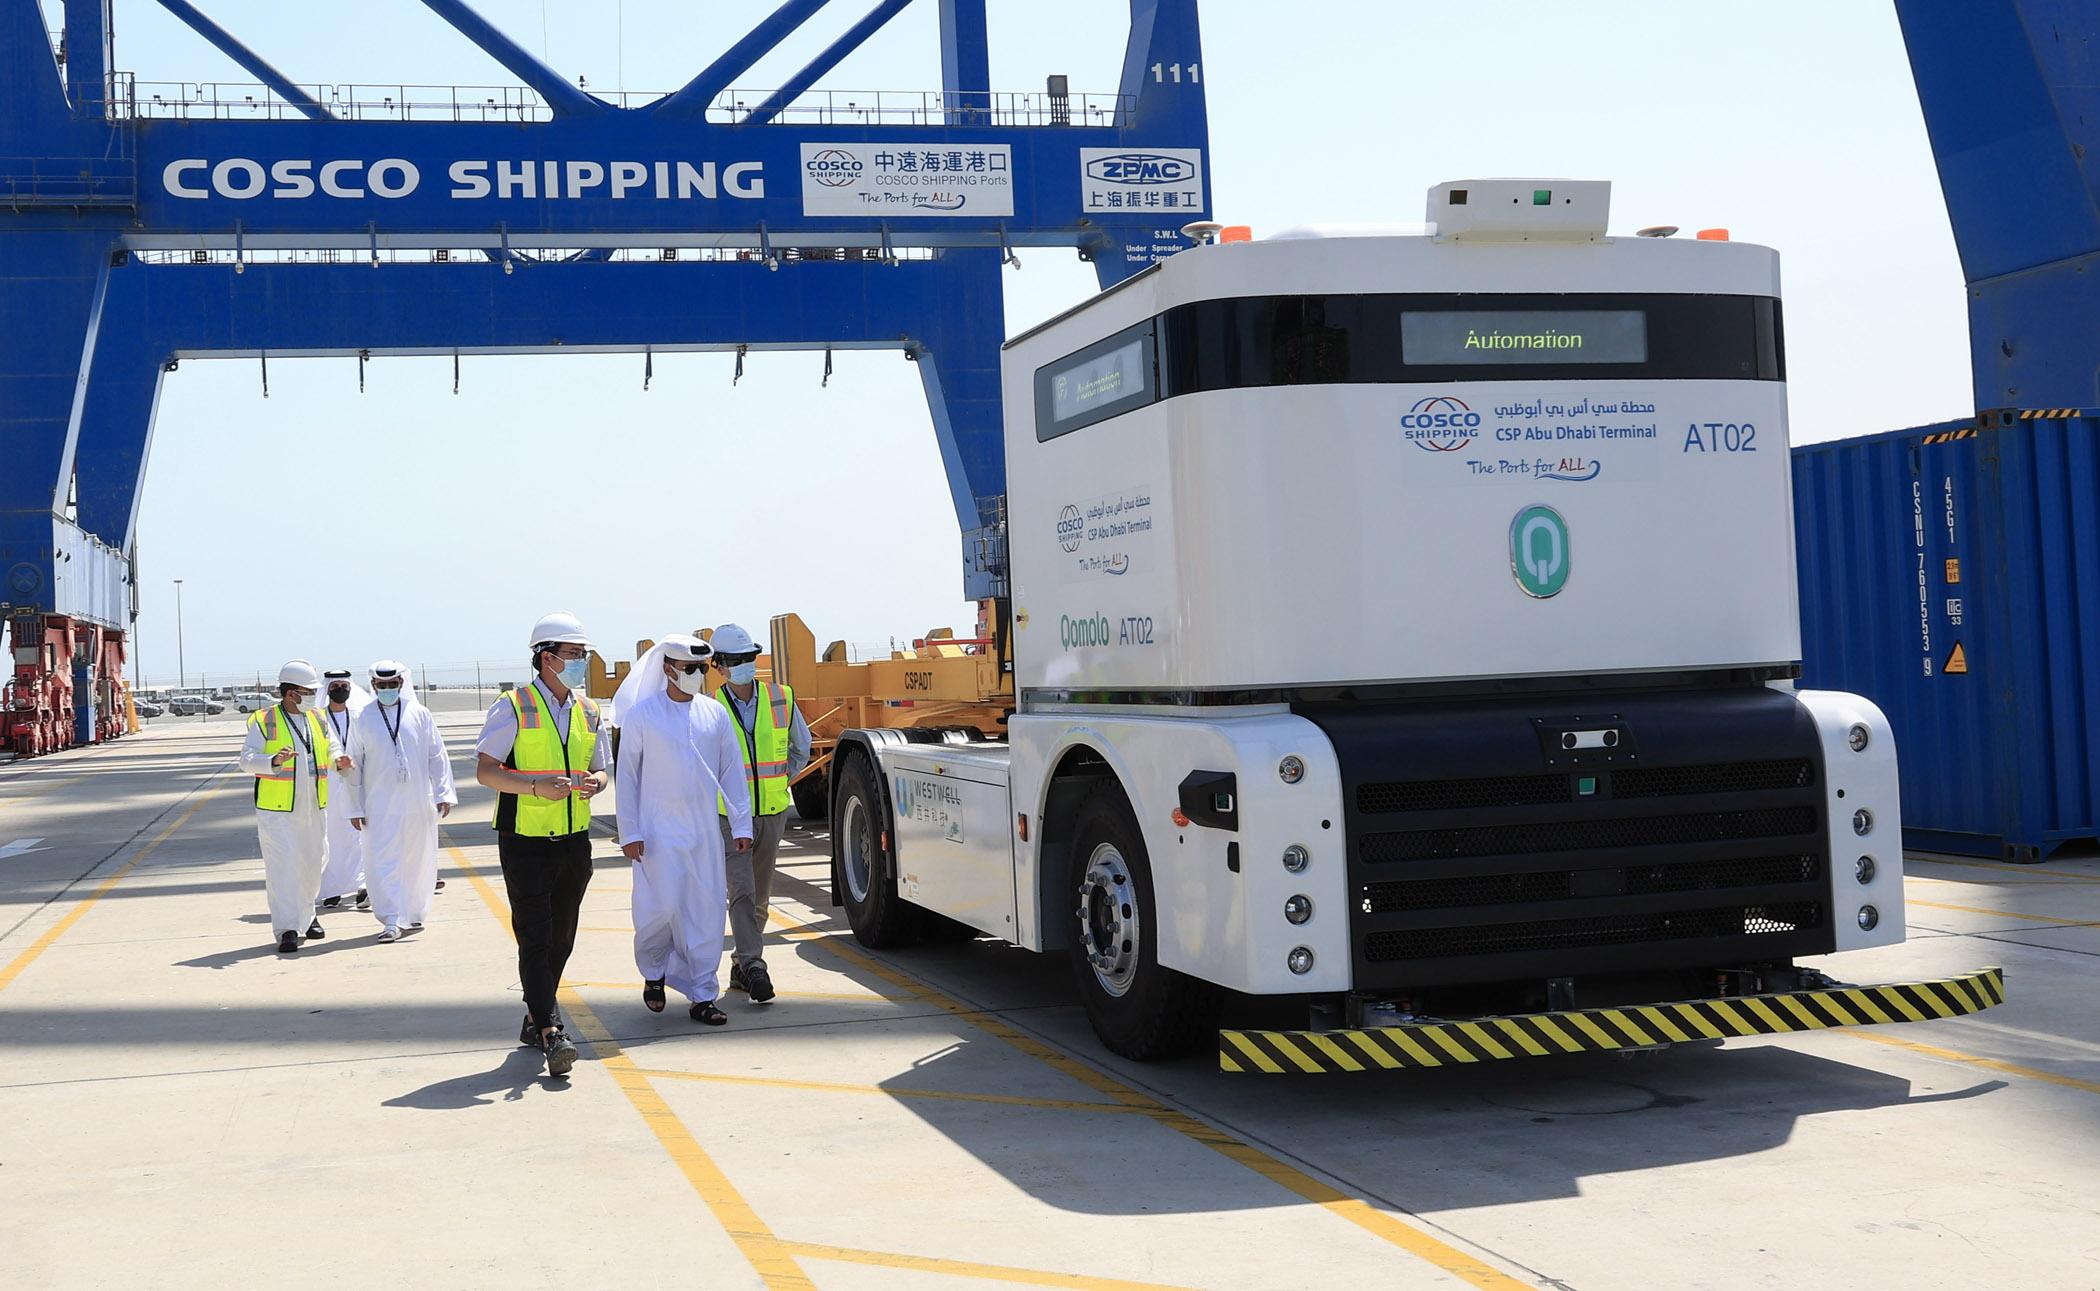 CSP Abu Dhabi Terminal and Khalifa Port implement region's first autonomous port truck system